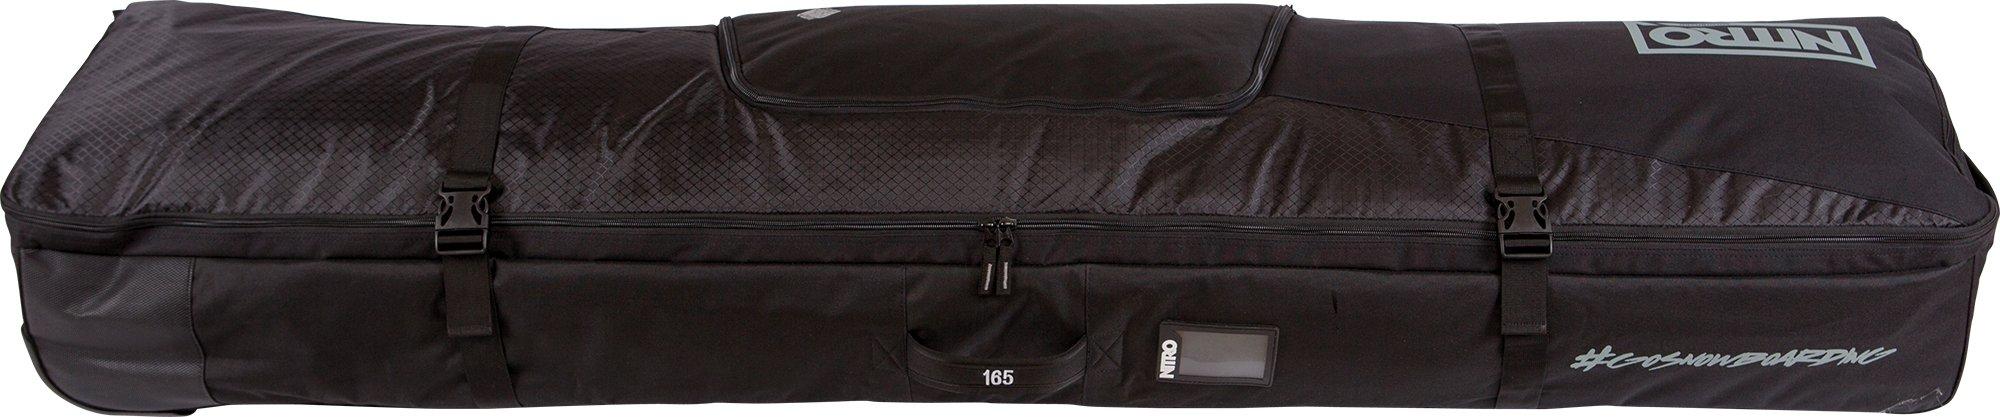 Nitro Tracker Wheelie Snowboard Bag 165cm (black) by Nitro